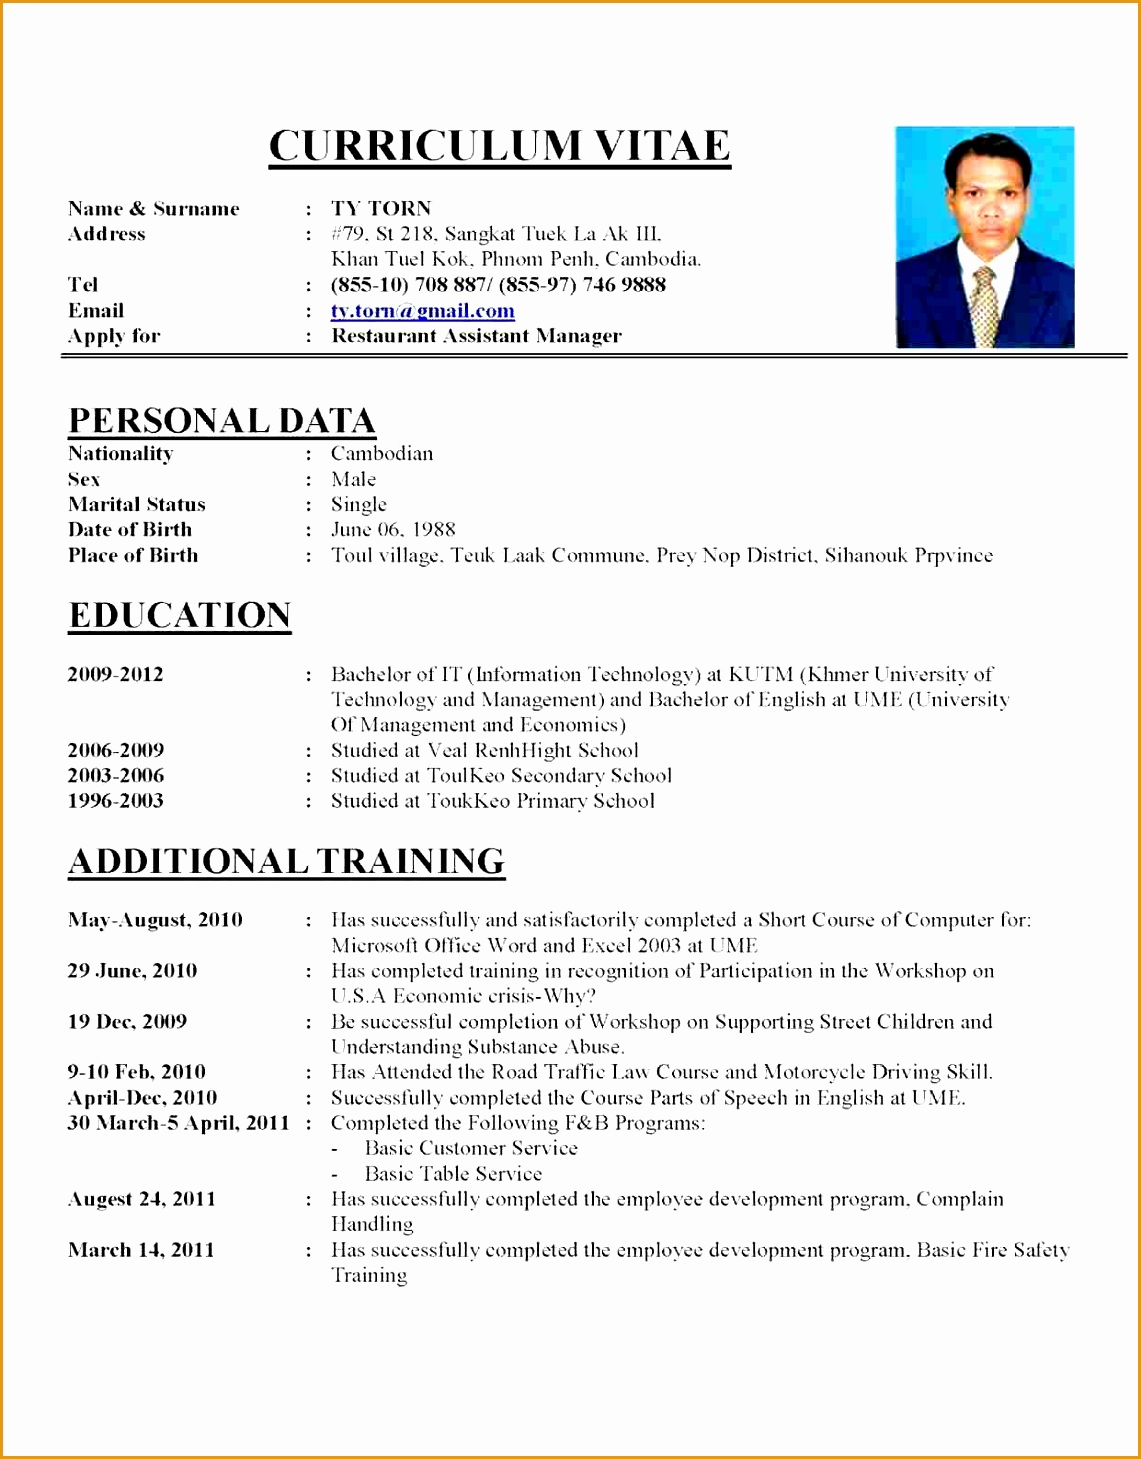 public health internship resume sample